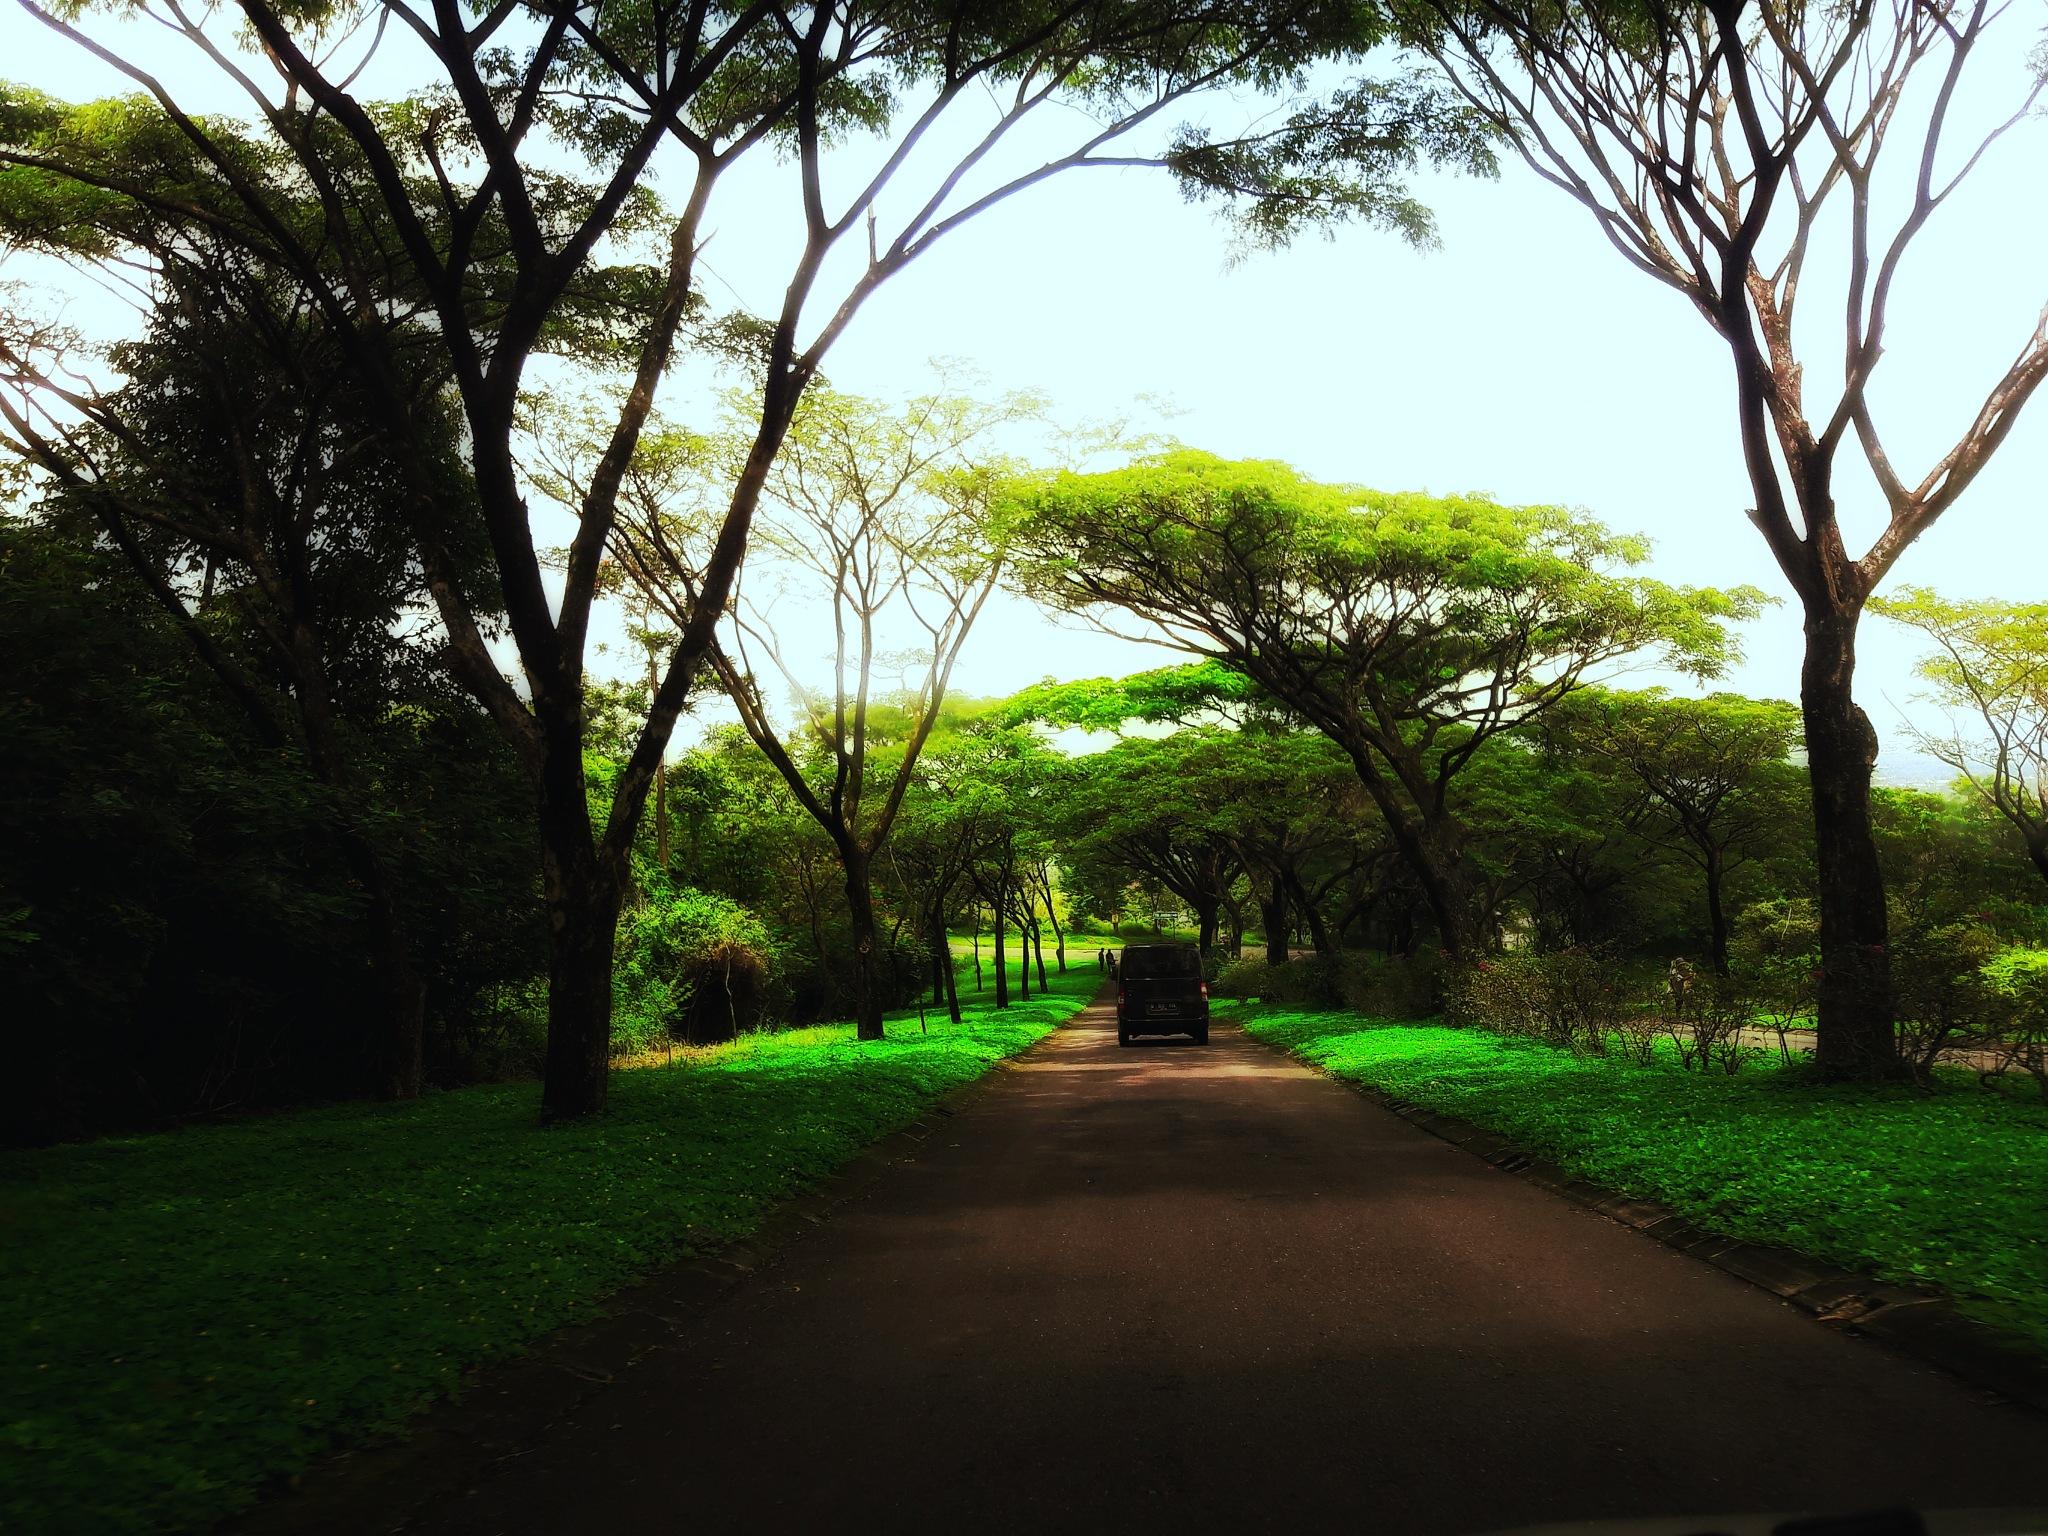 on my way by Mutiara